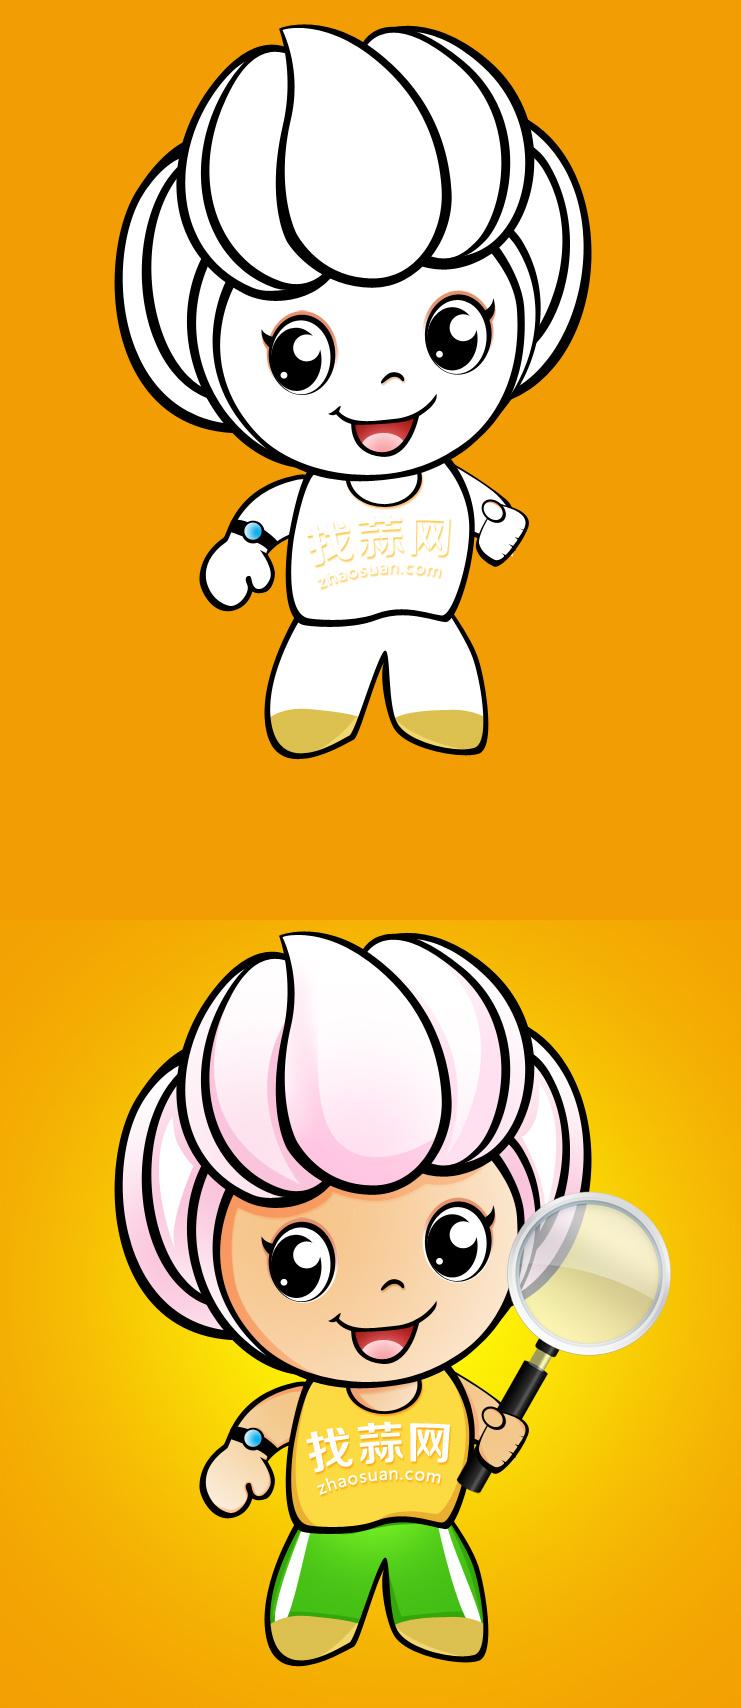 吉祥物论+�y�!�o_吉祥物